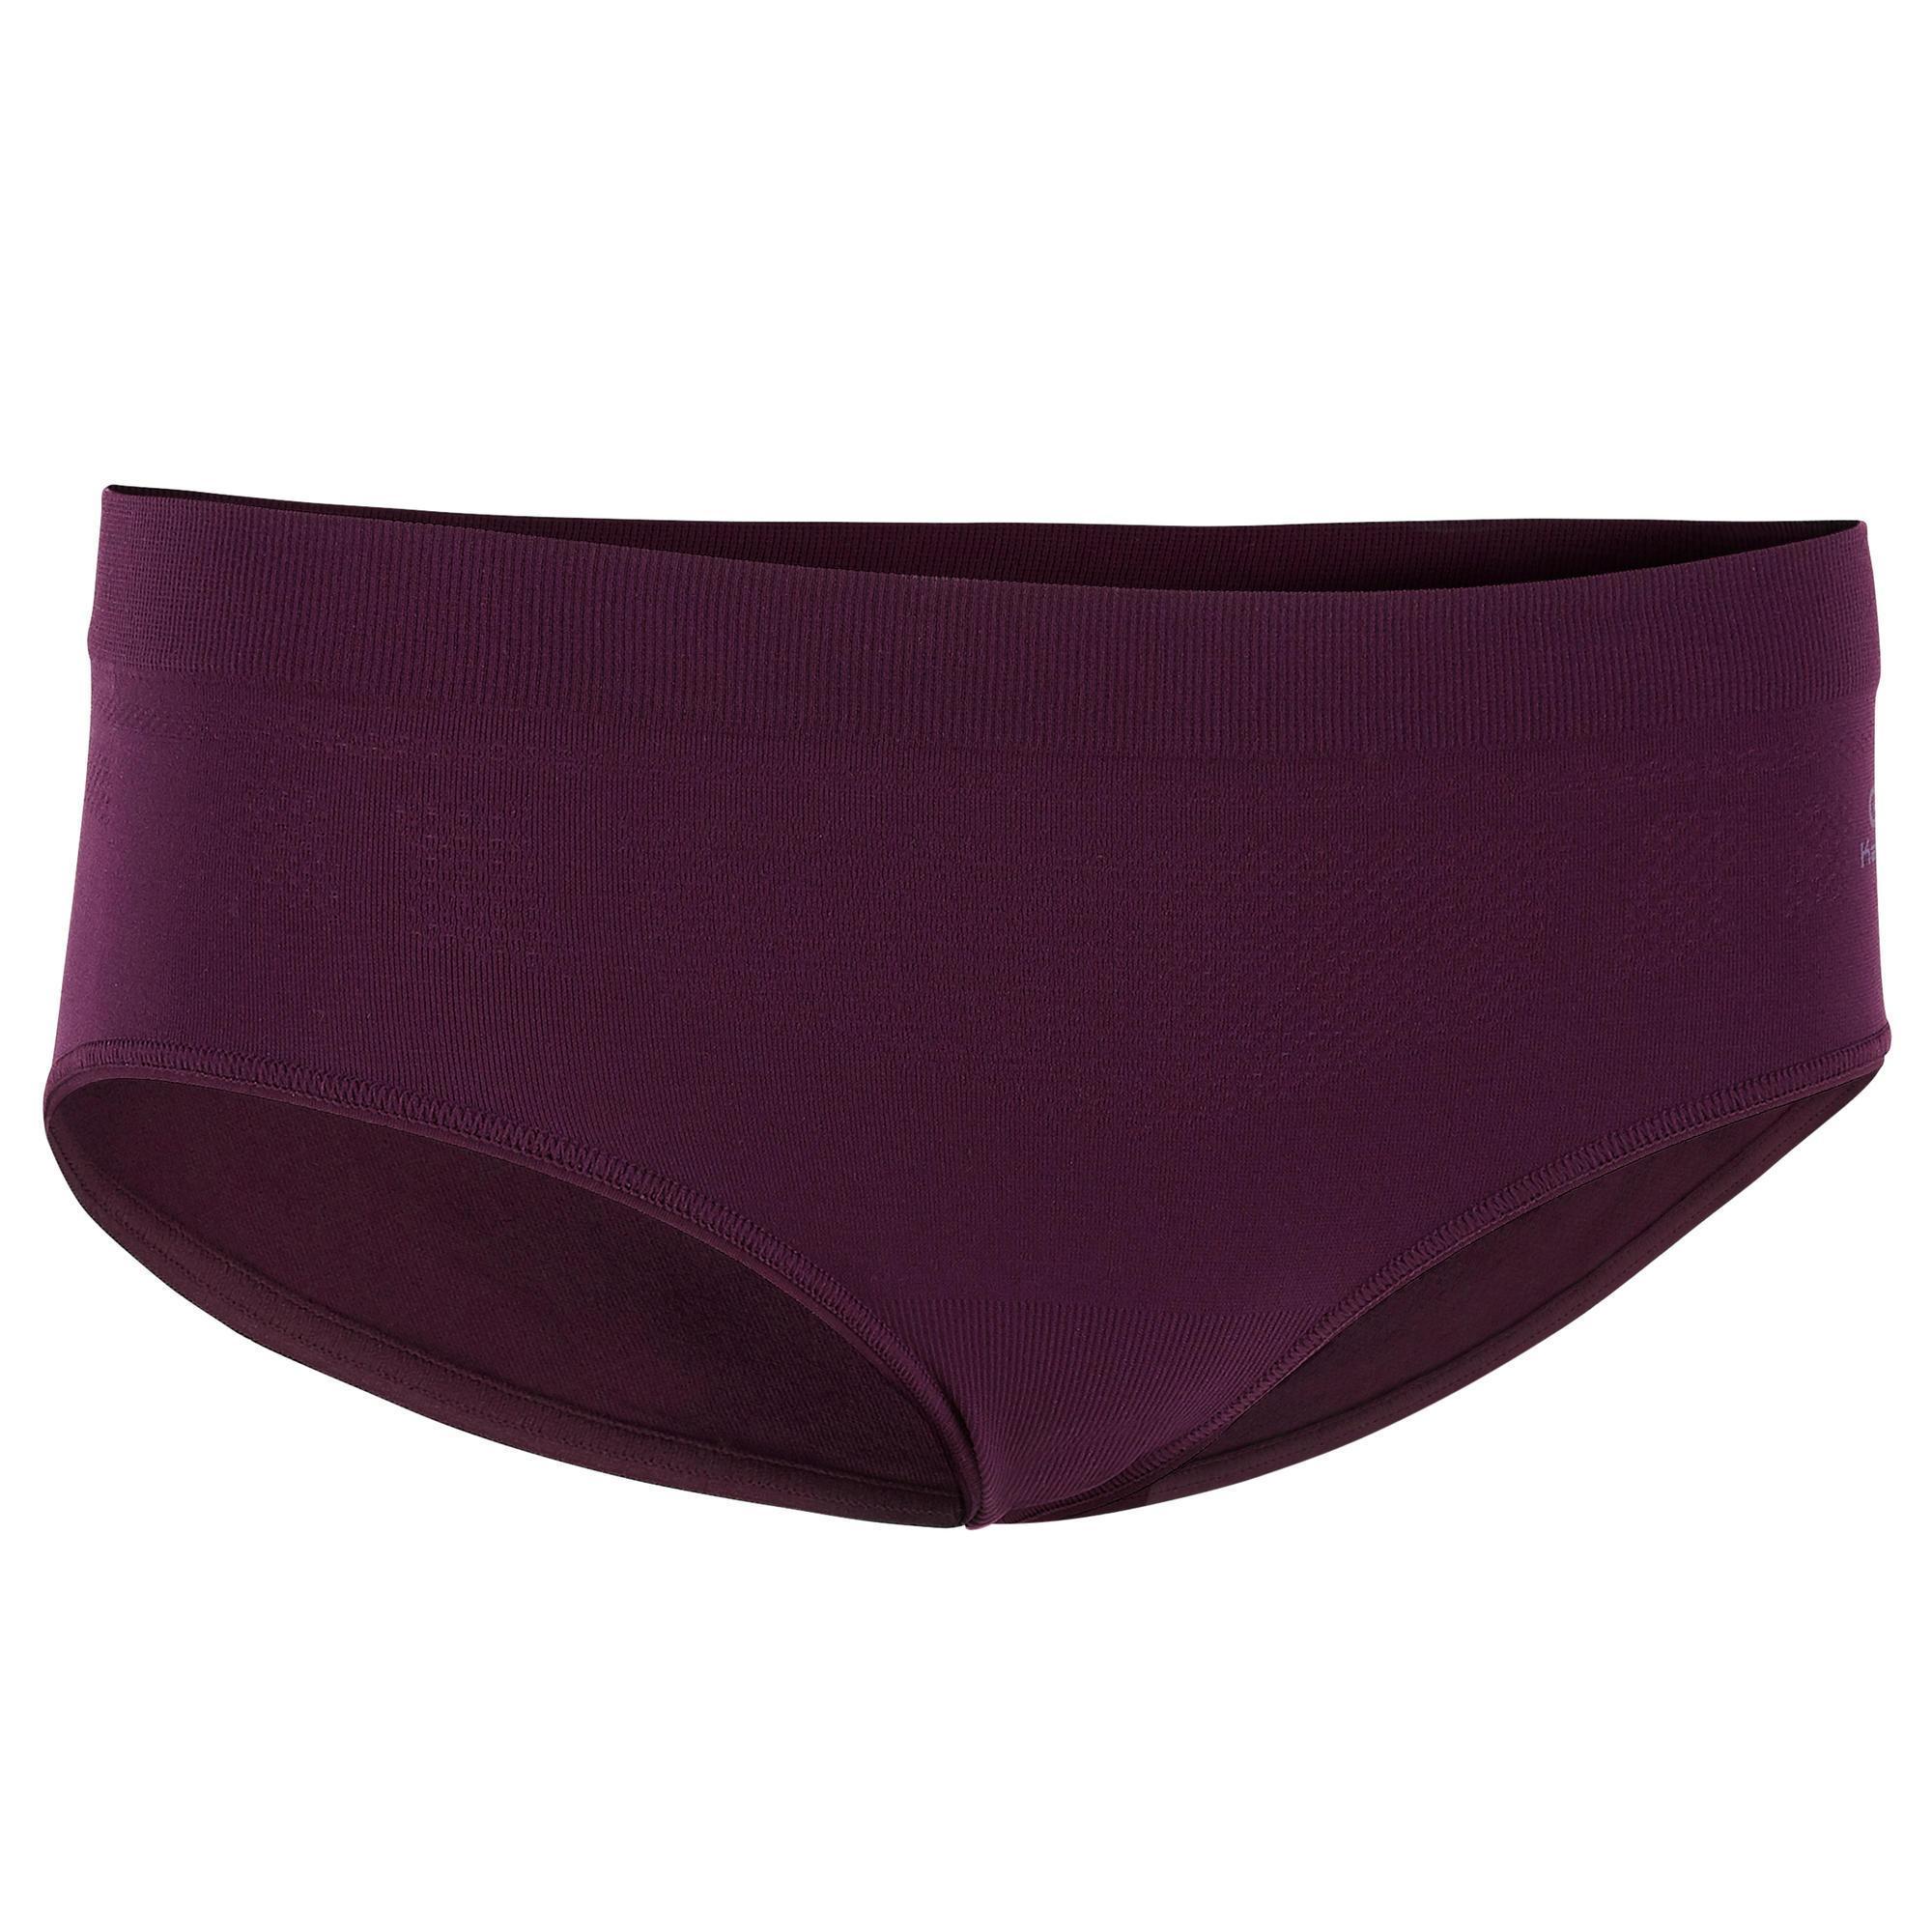 Funktionsunterhose Lauf-Slip atmungsaktiv pflaume | Sportbekleidung > Funktionswäsche | Violett | Kalenji